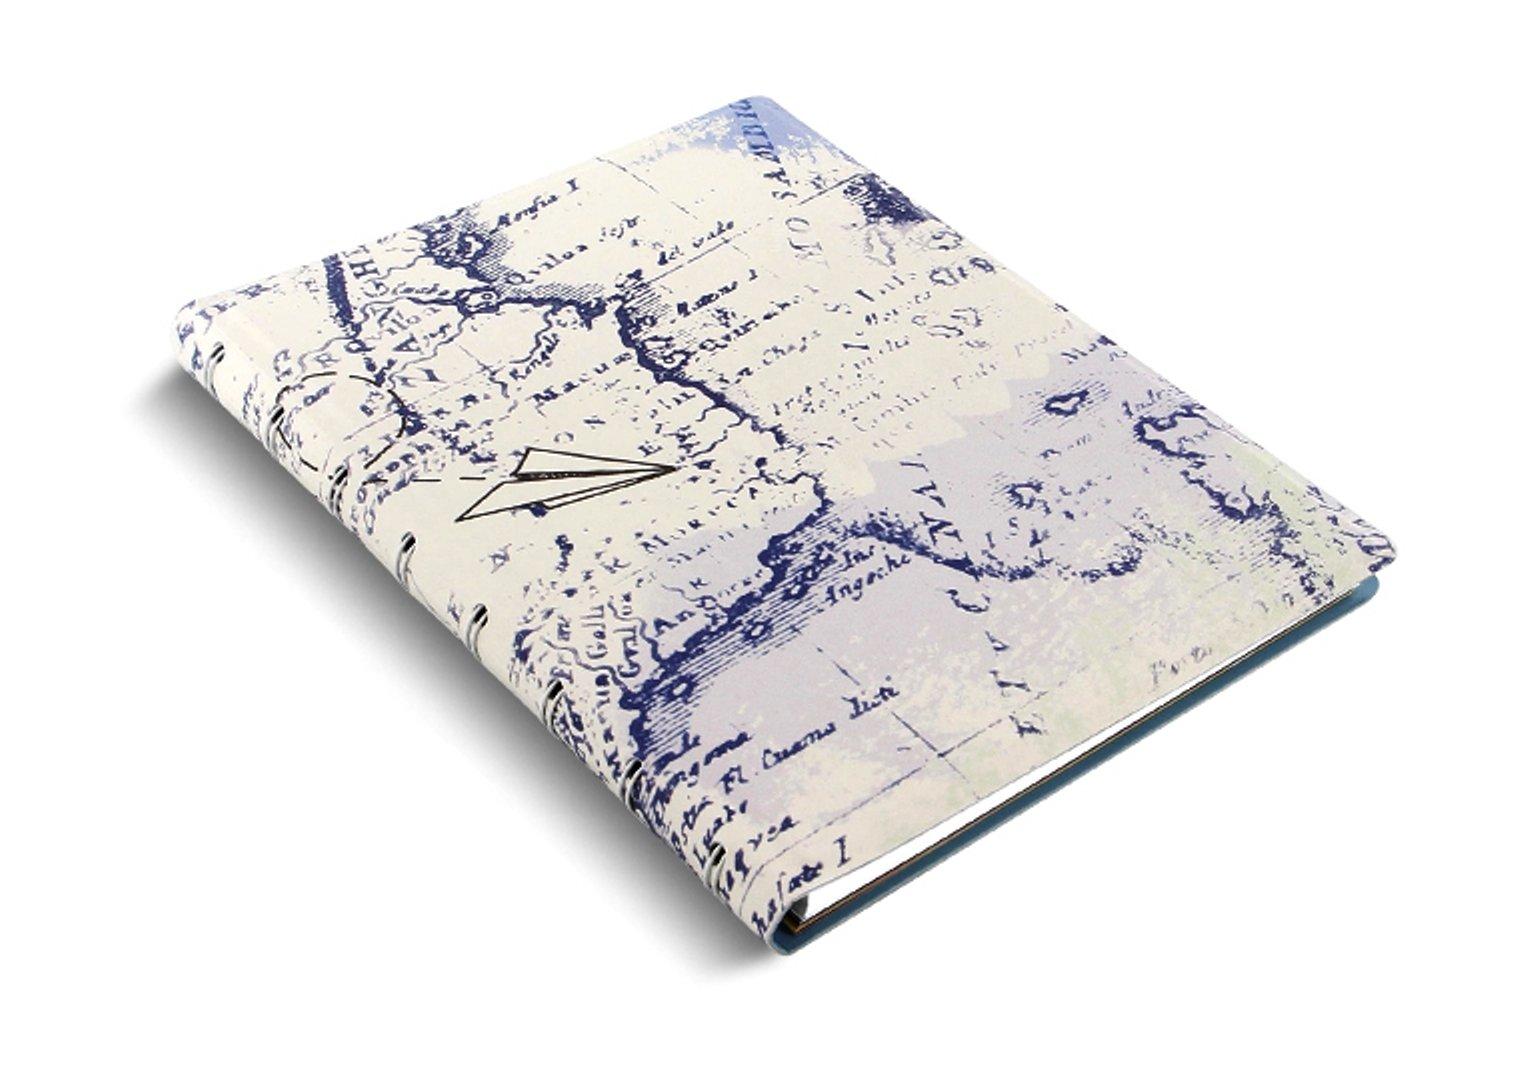 filofax notebook patterns a5 retro map landkarte notizbuch spiralbindung 115049 ebay. Black Bedroom Furniture Sets. Home Design Ideas